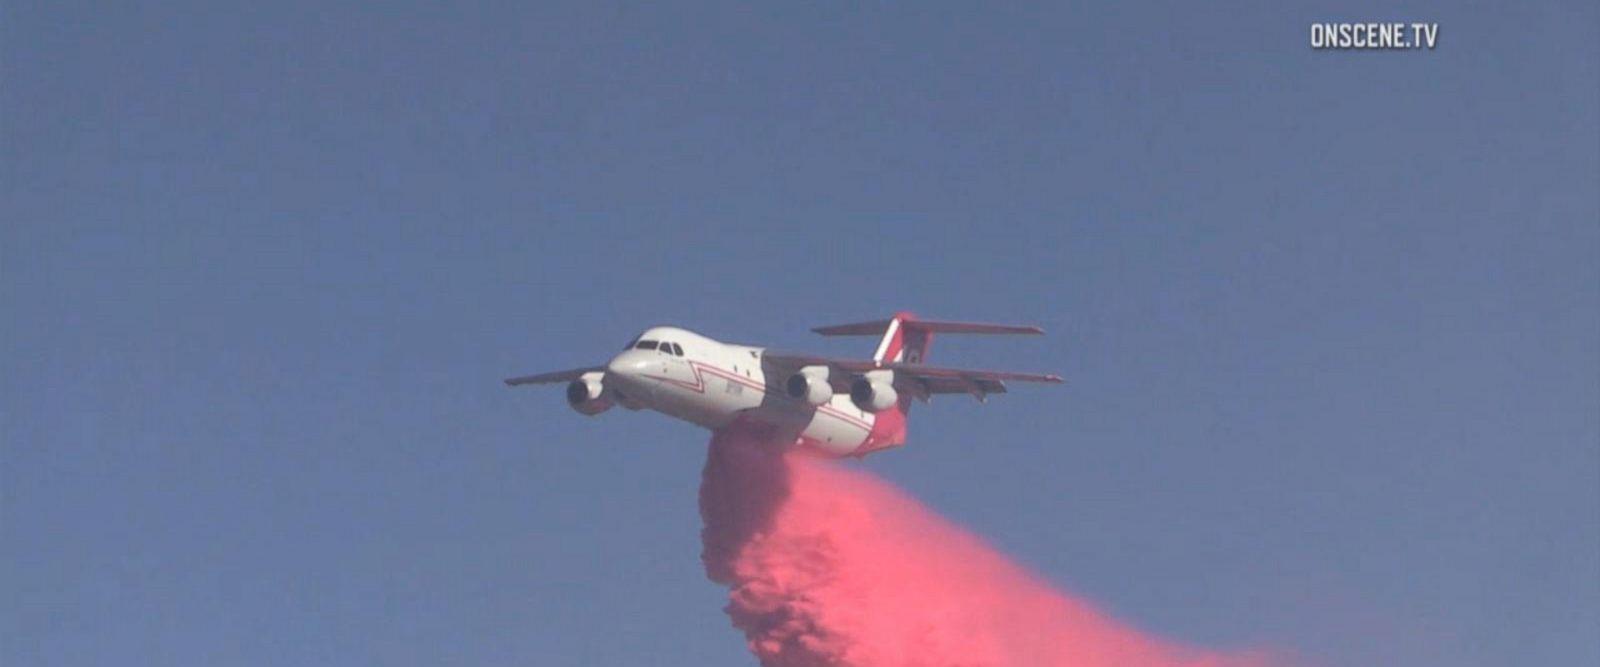 VIDEO: Wildfires spread as conditions worsen in California